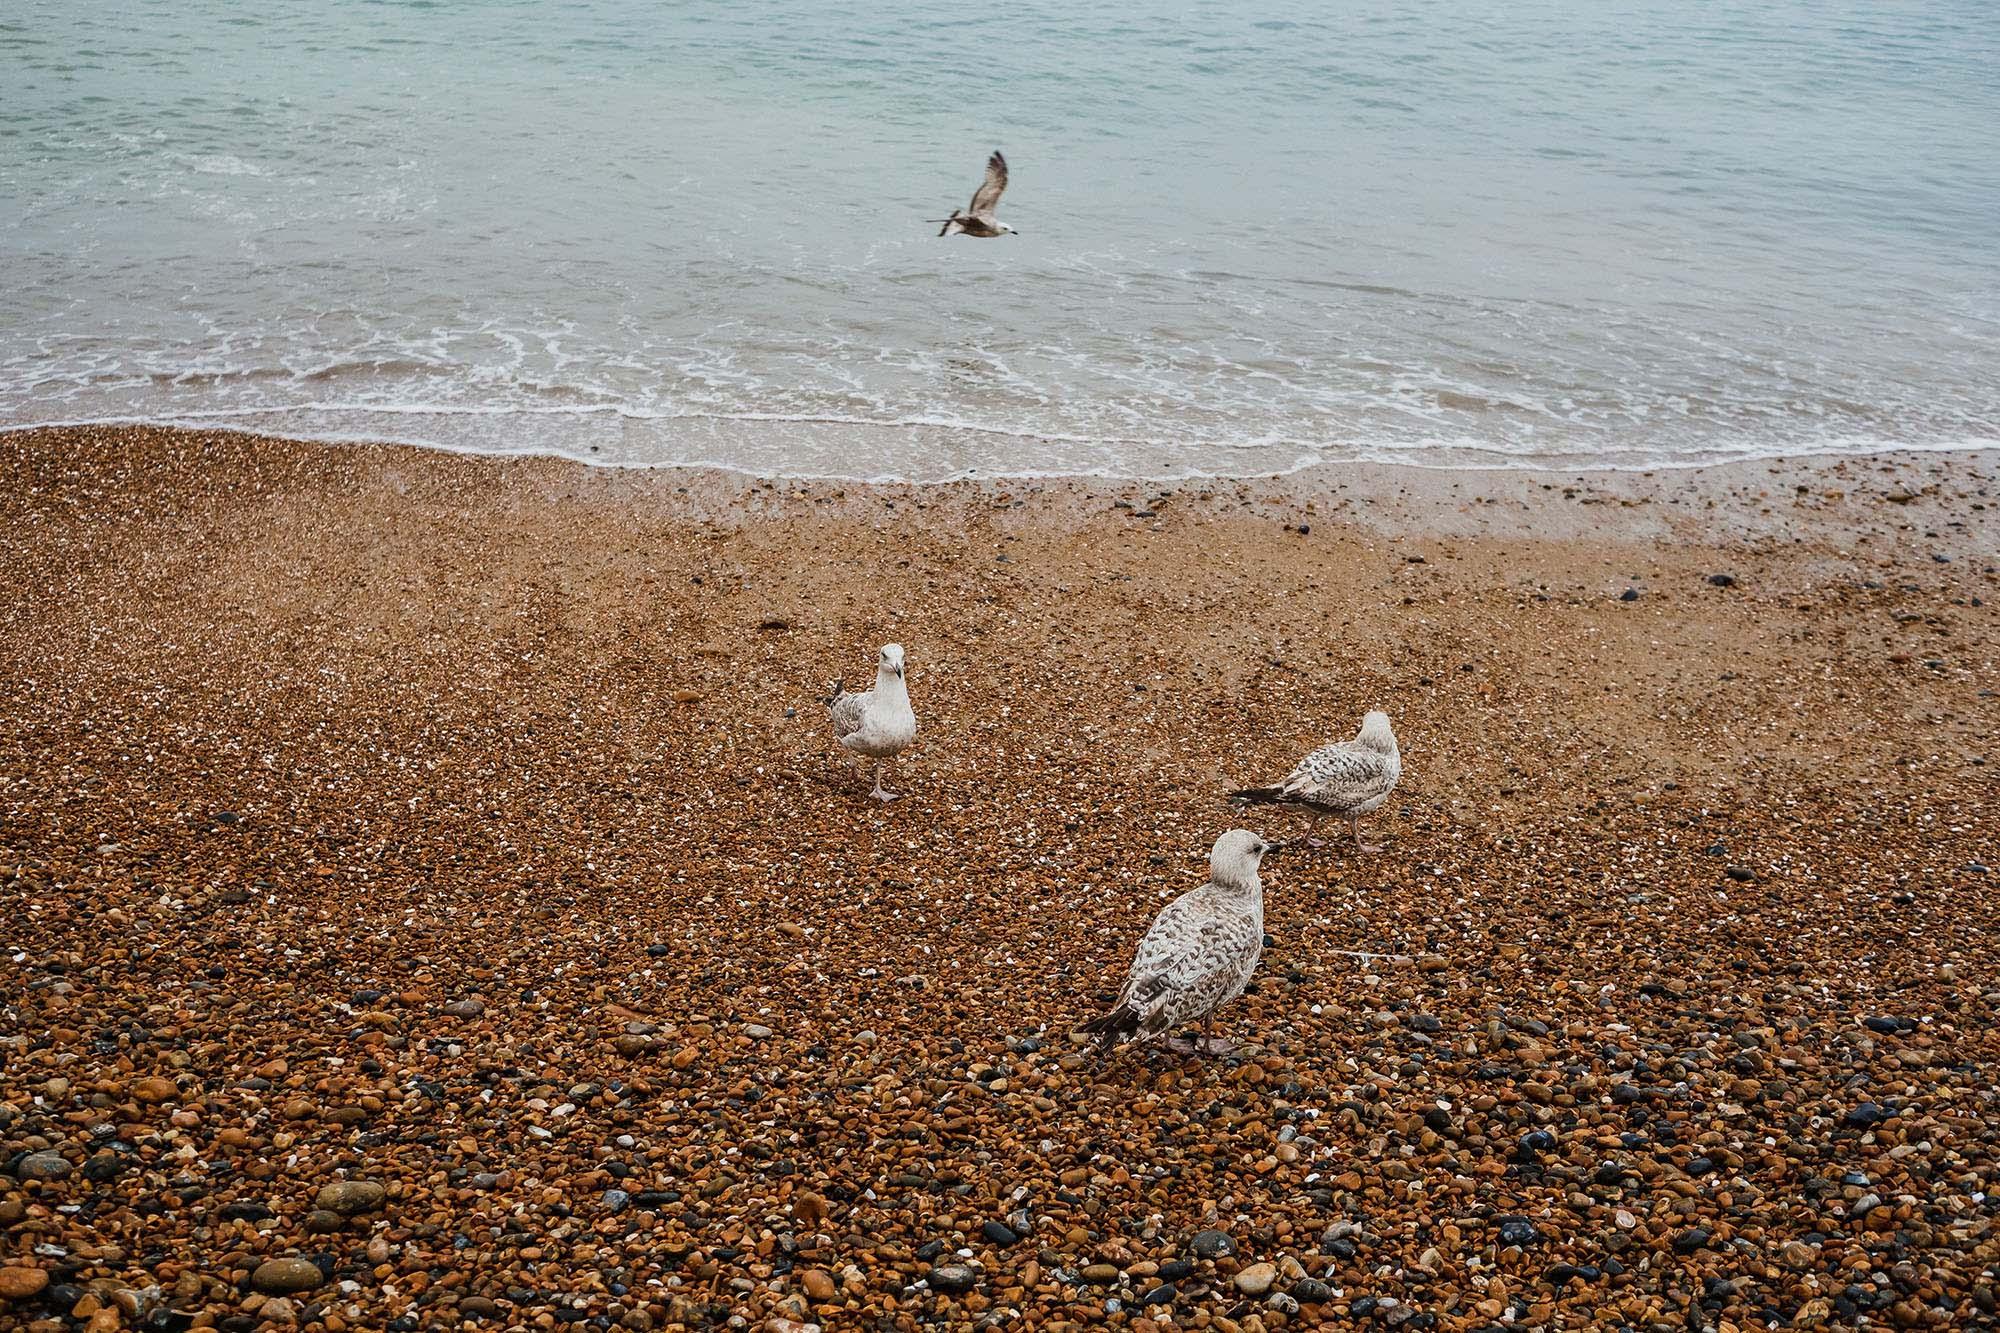 24 hours of photos in Brighton